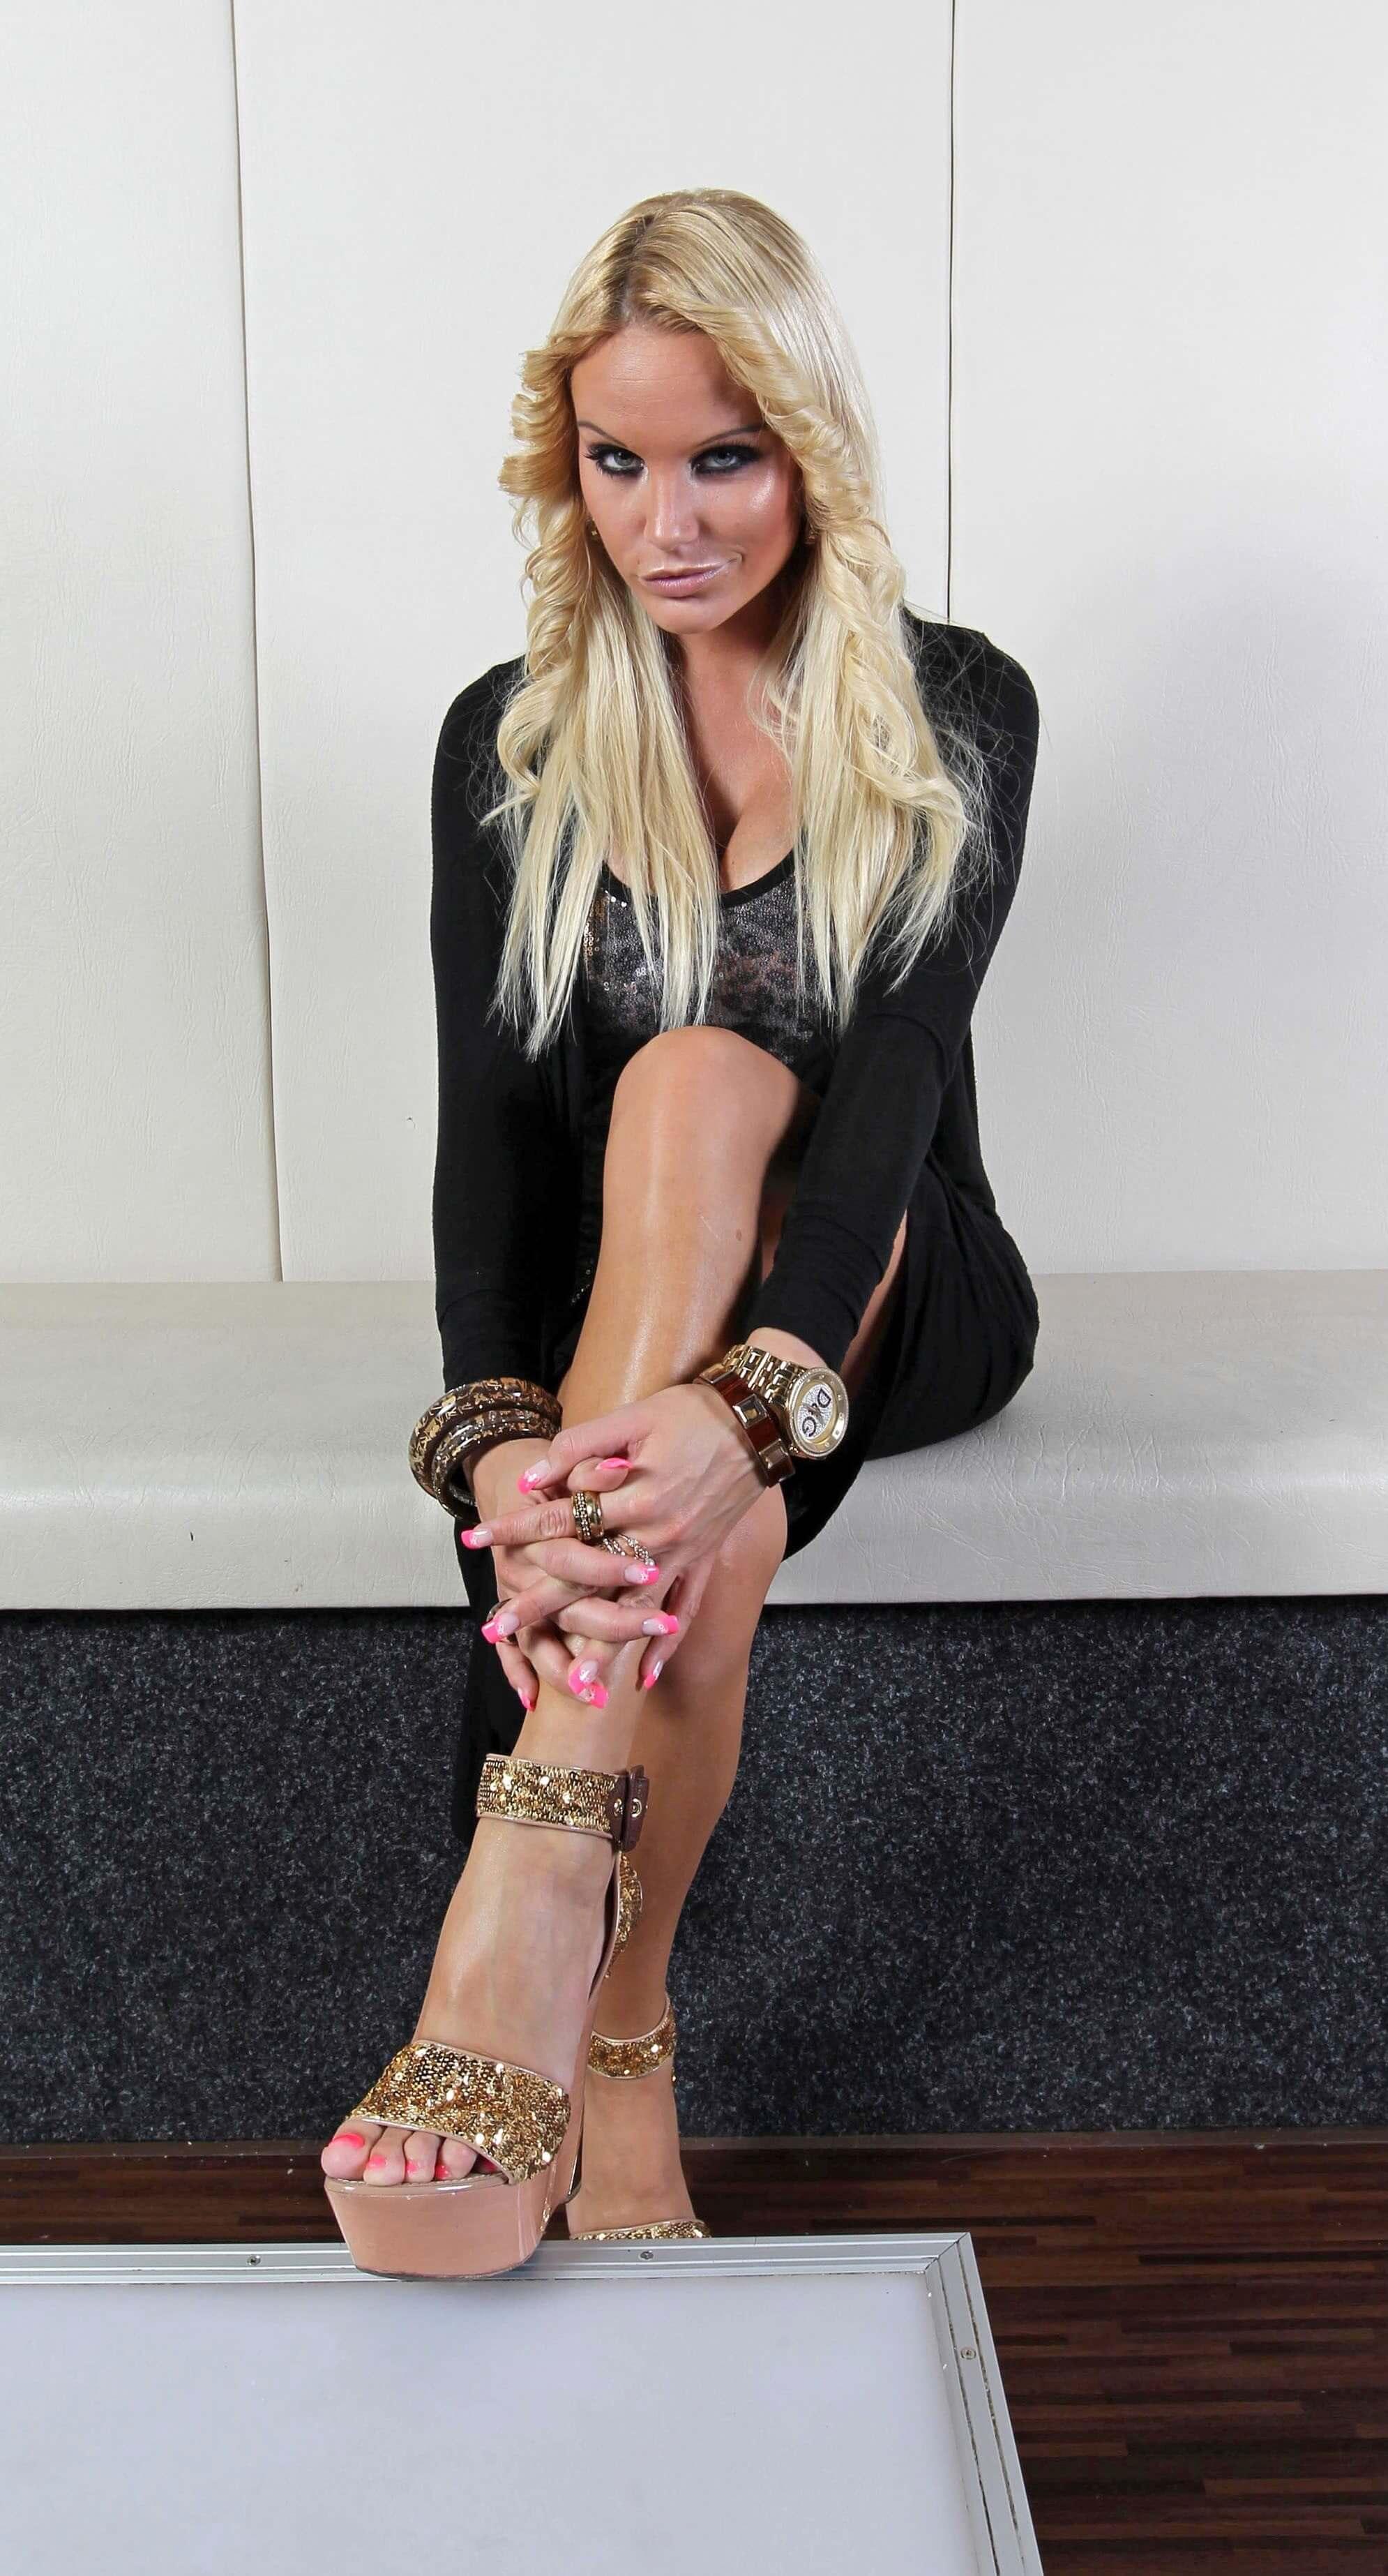 Gina Lisa Lohfink Pics